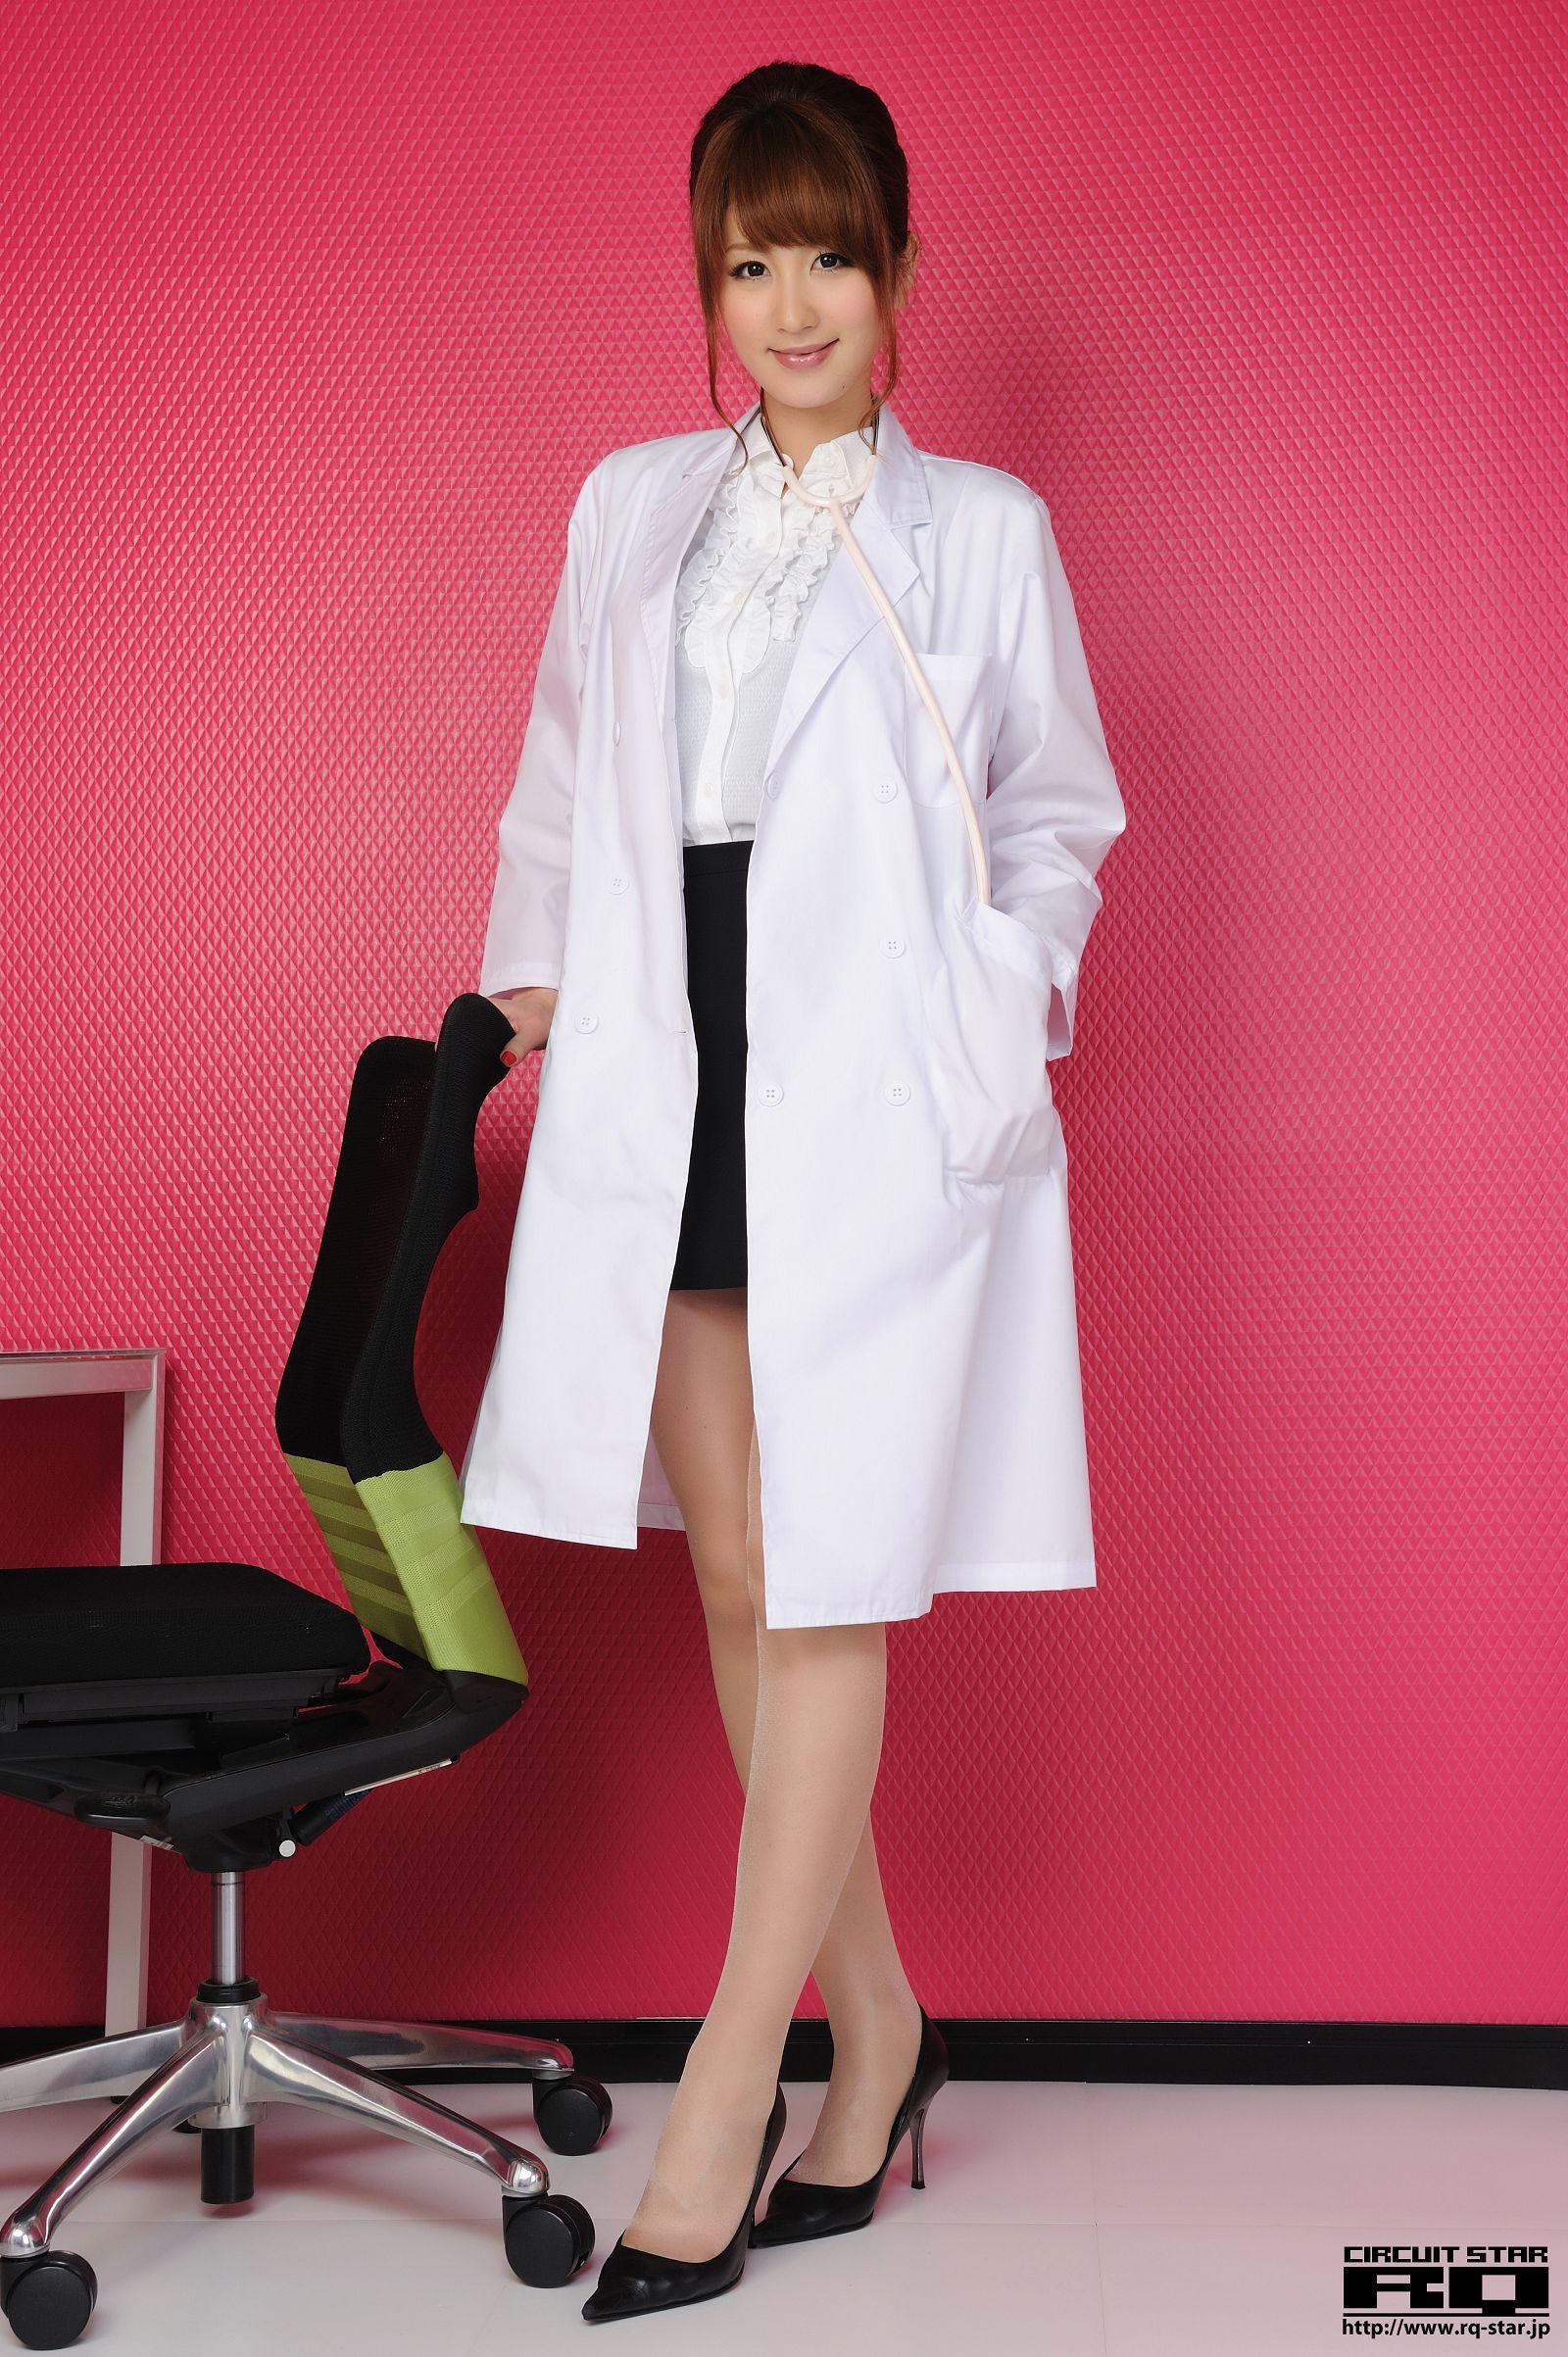 [RQ STAR美女] NO.00633 Maasa Maeda 前田真麻 Doctor Maasa[110P] RQ STAR 第1张